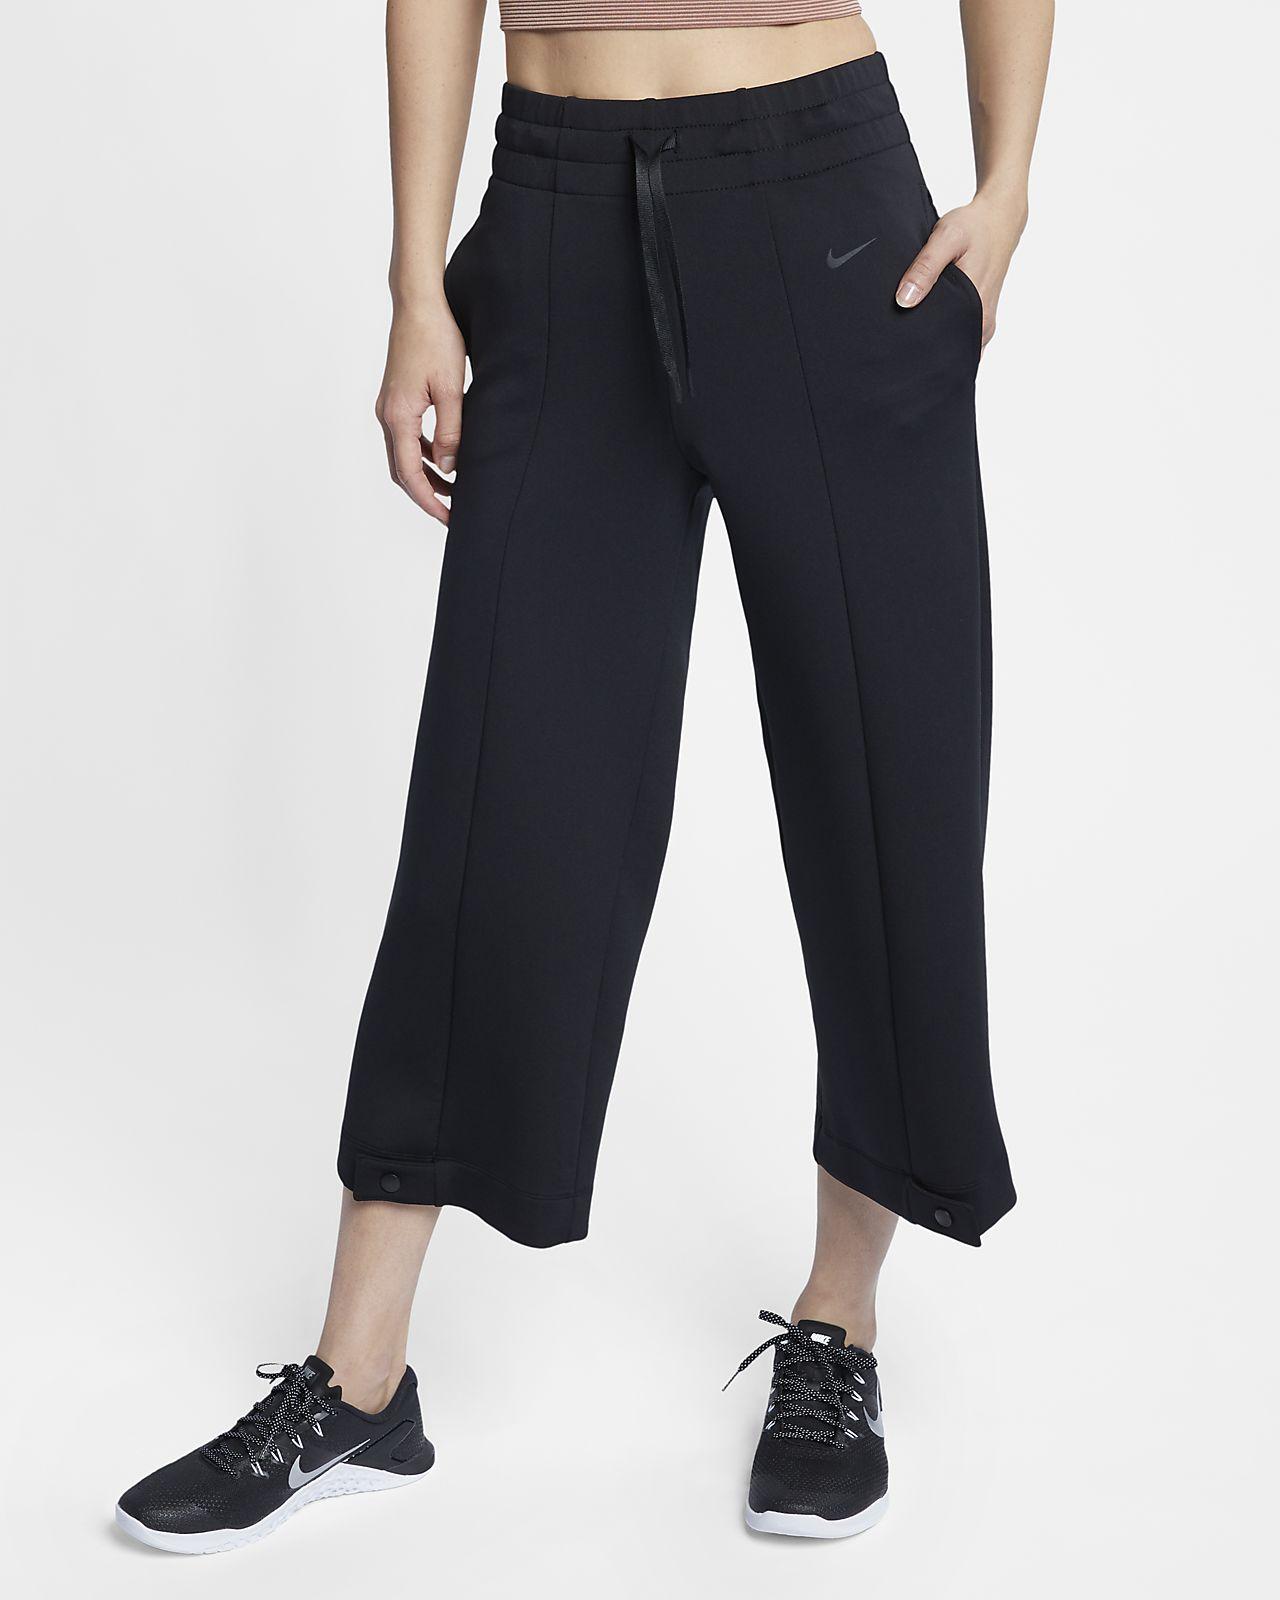 Pantalones de entrenamiento para mujer Nike Dri-FIT. Nike.com CL 26ce440947a